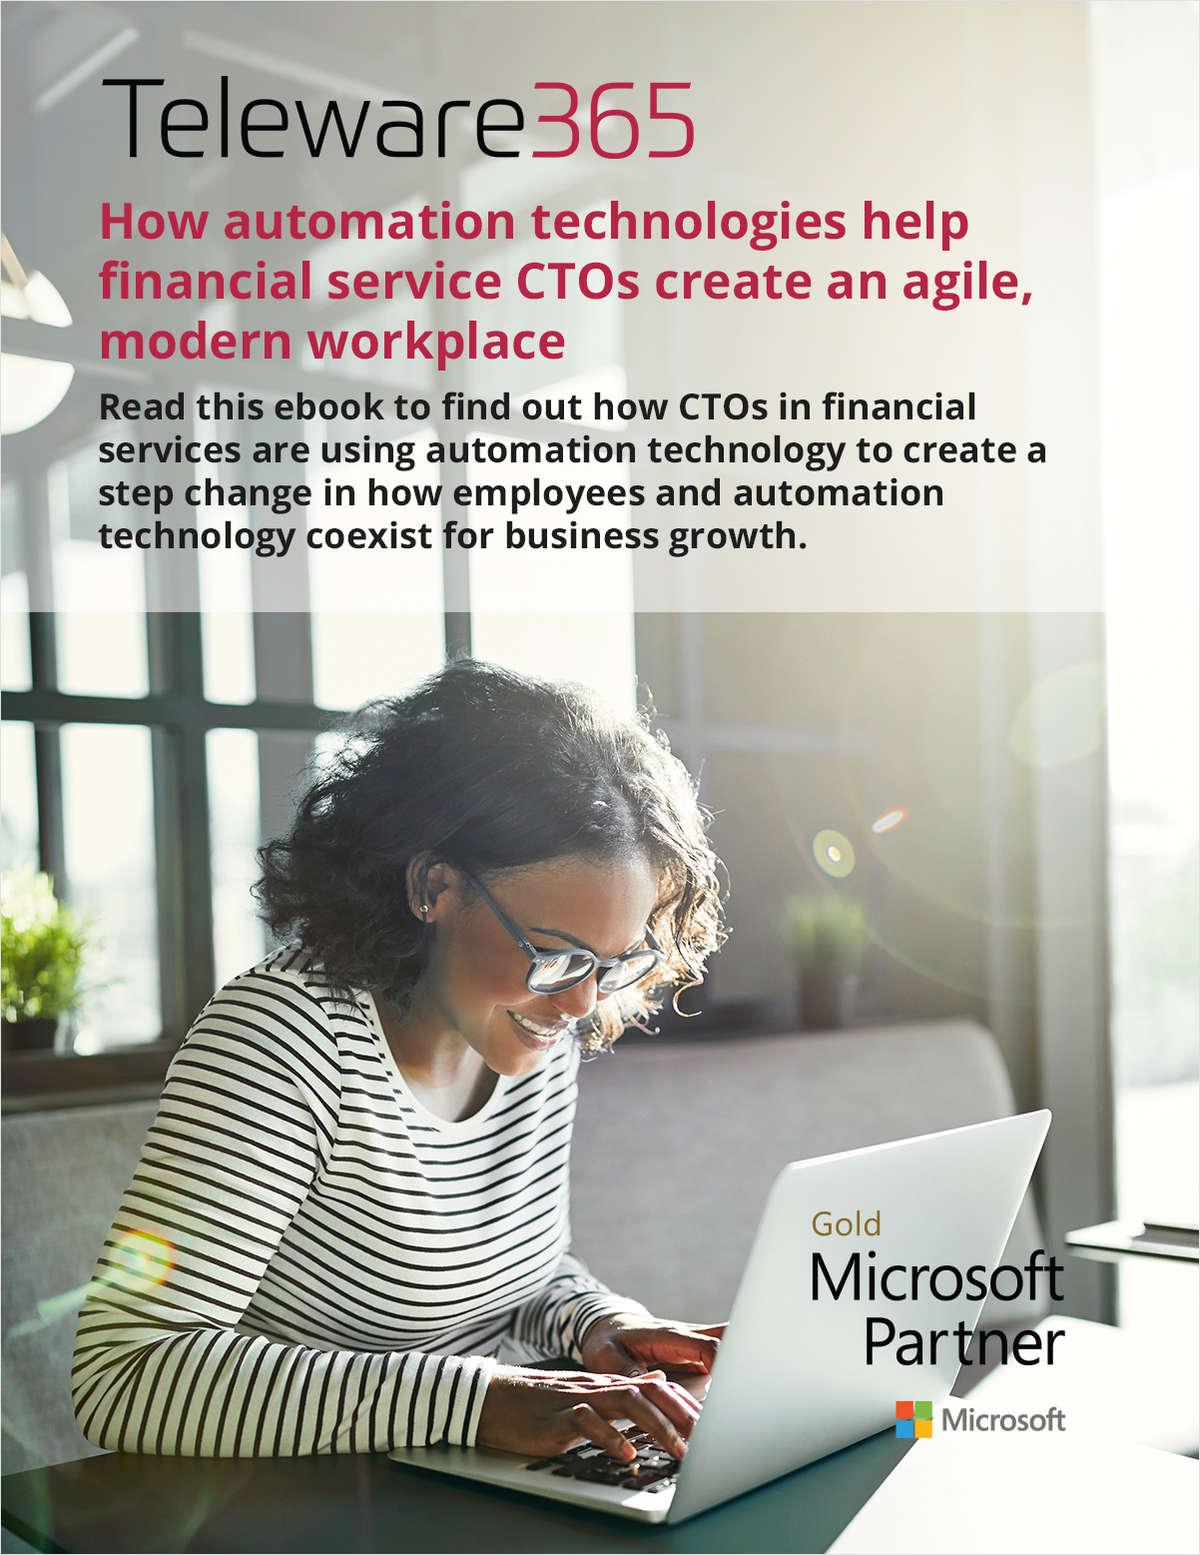 How automation technologies help financial service CTOs create an agile, modern workplace